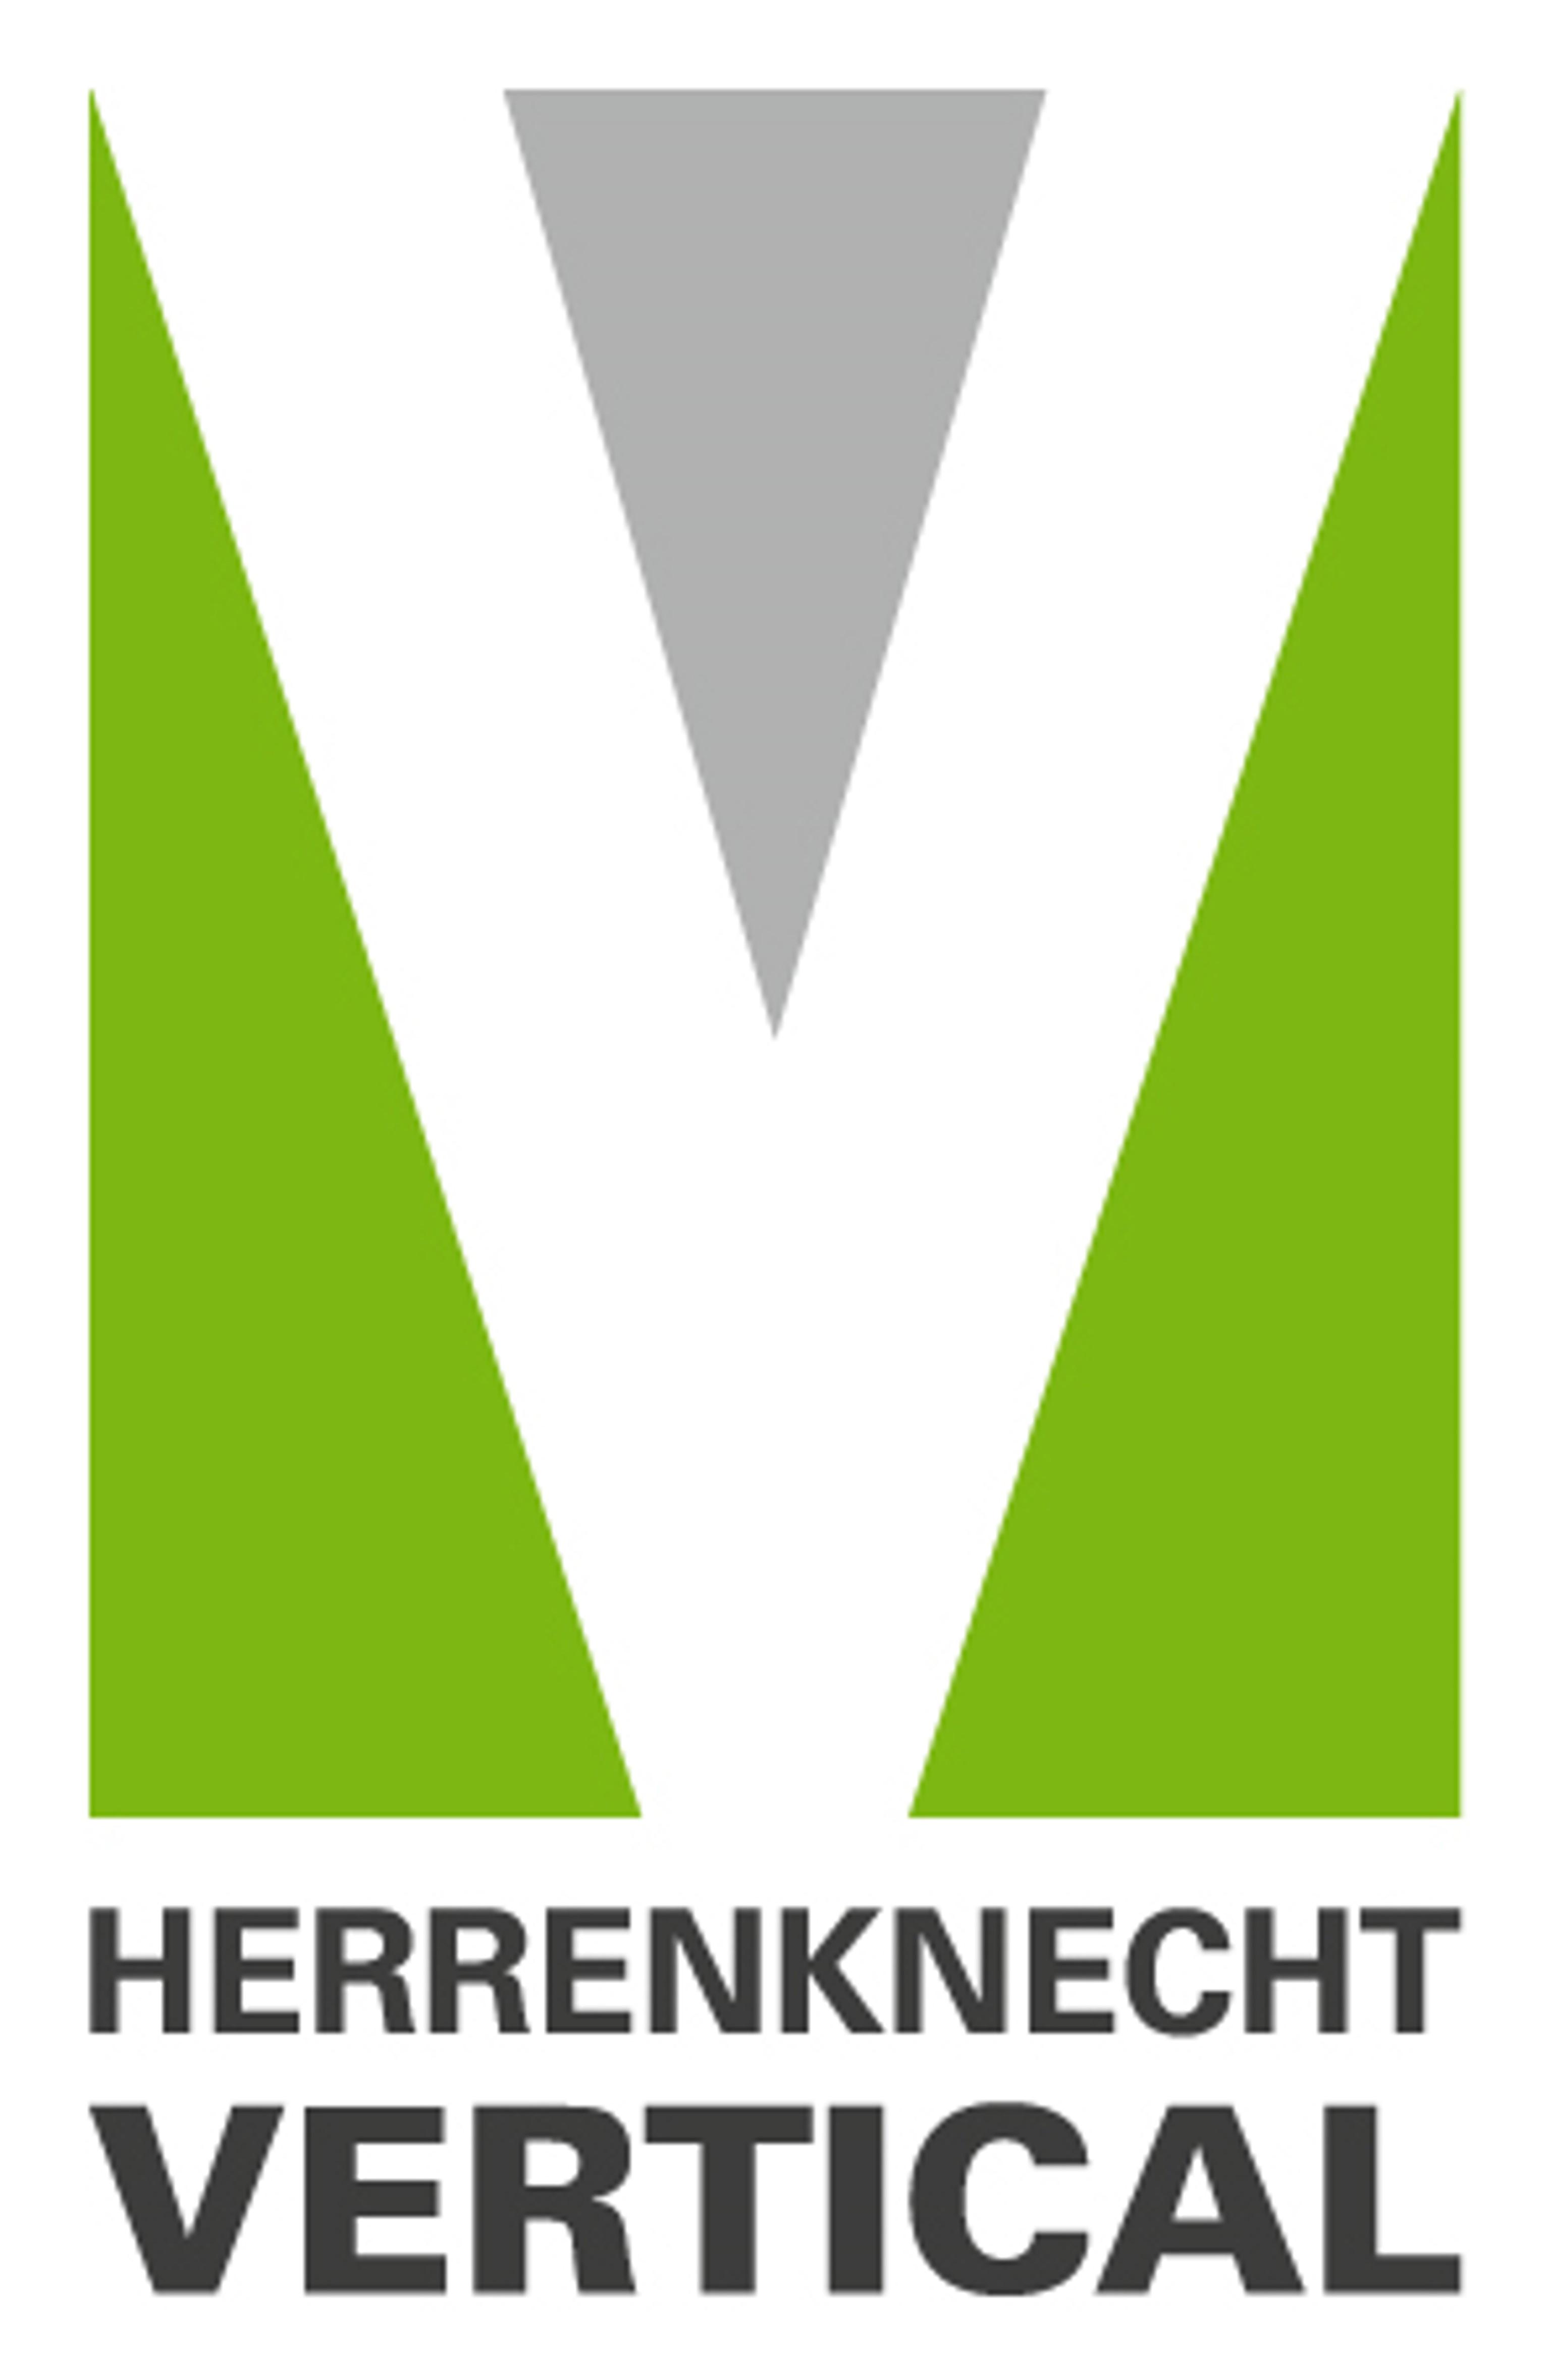 stc 2018 - german section, Spe Presentation Template, Presentation templates